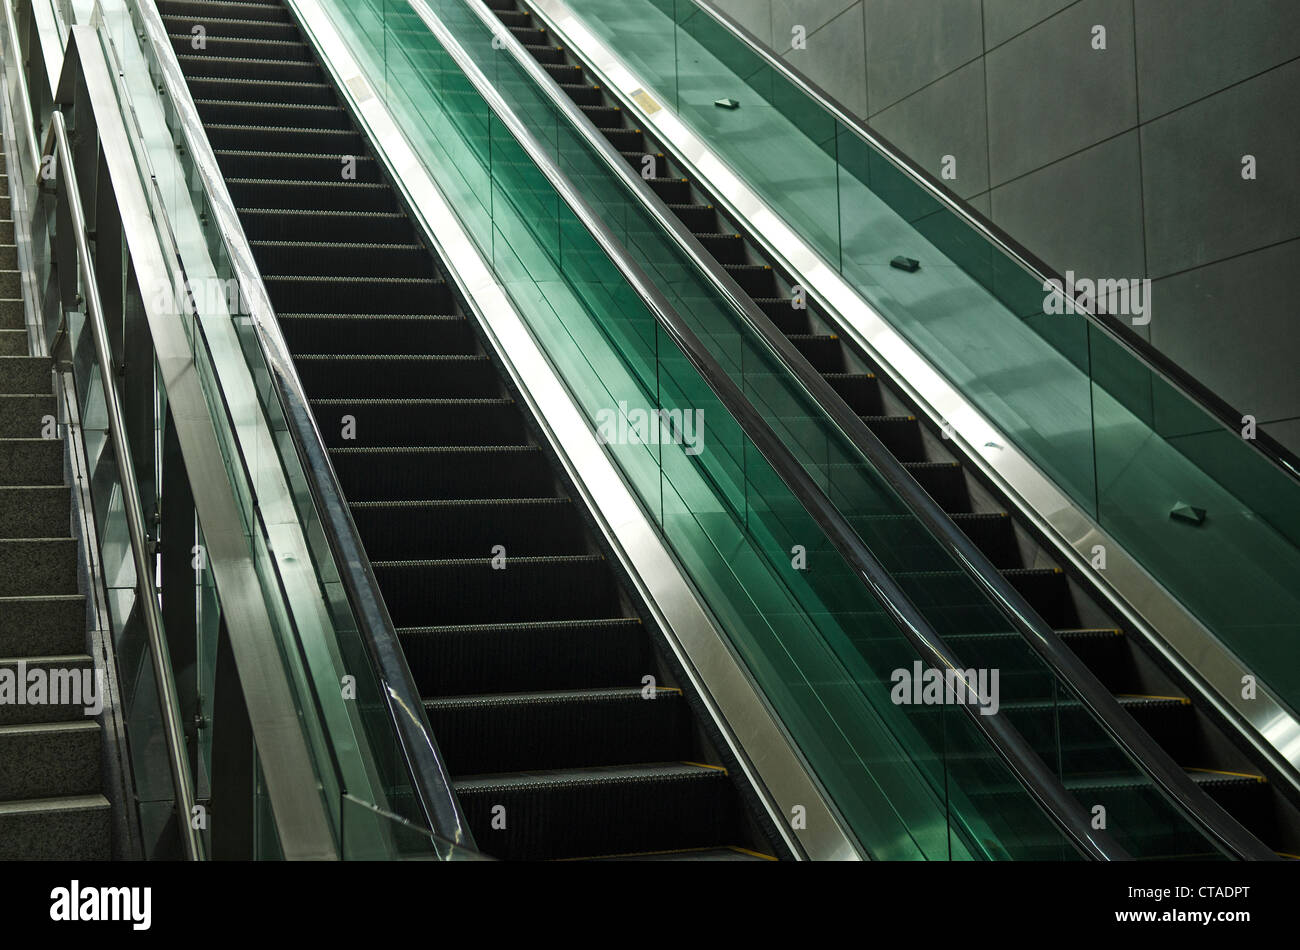 detail of modern glass and metal escalator - Stock Image